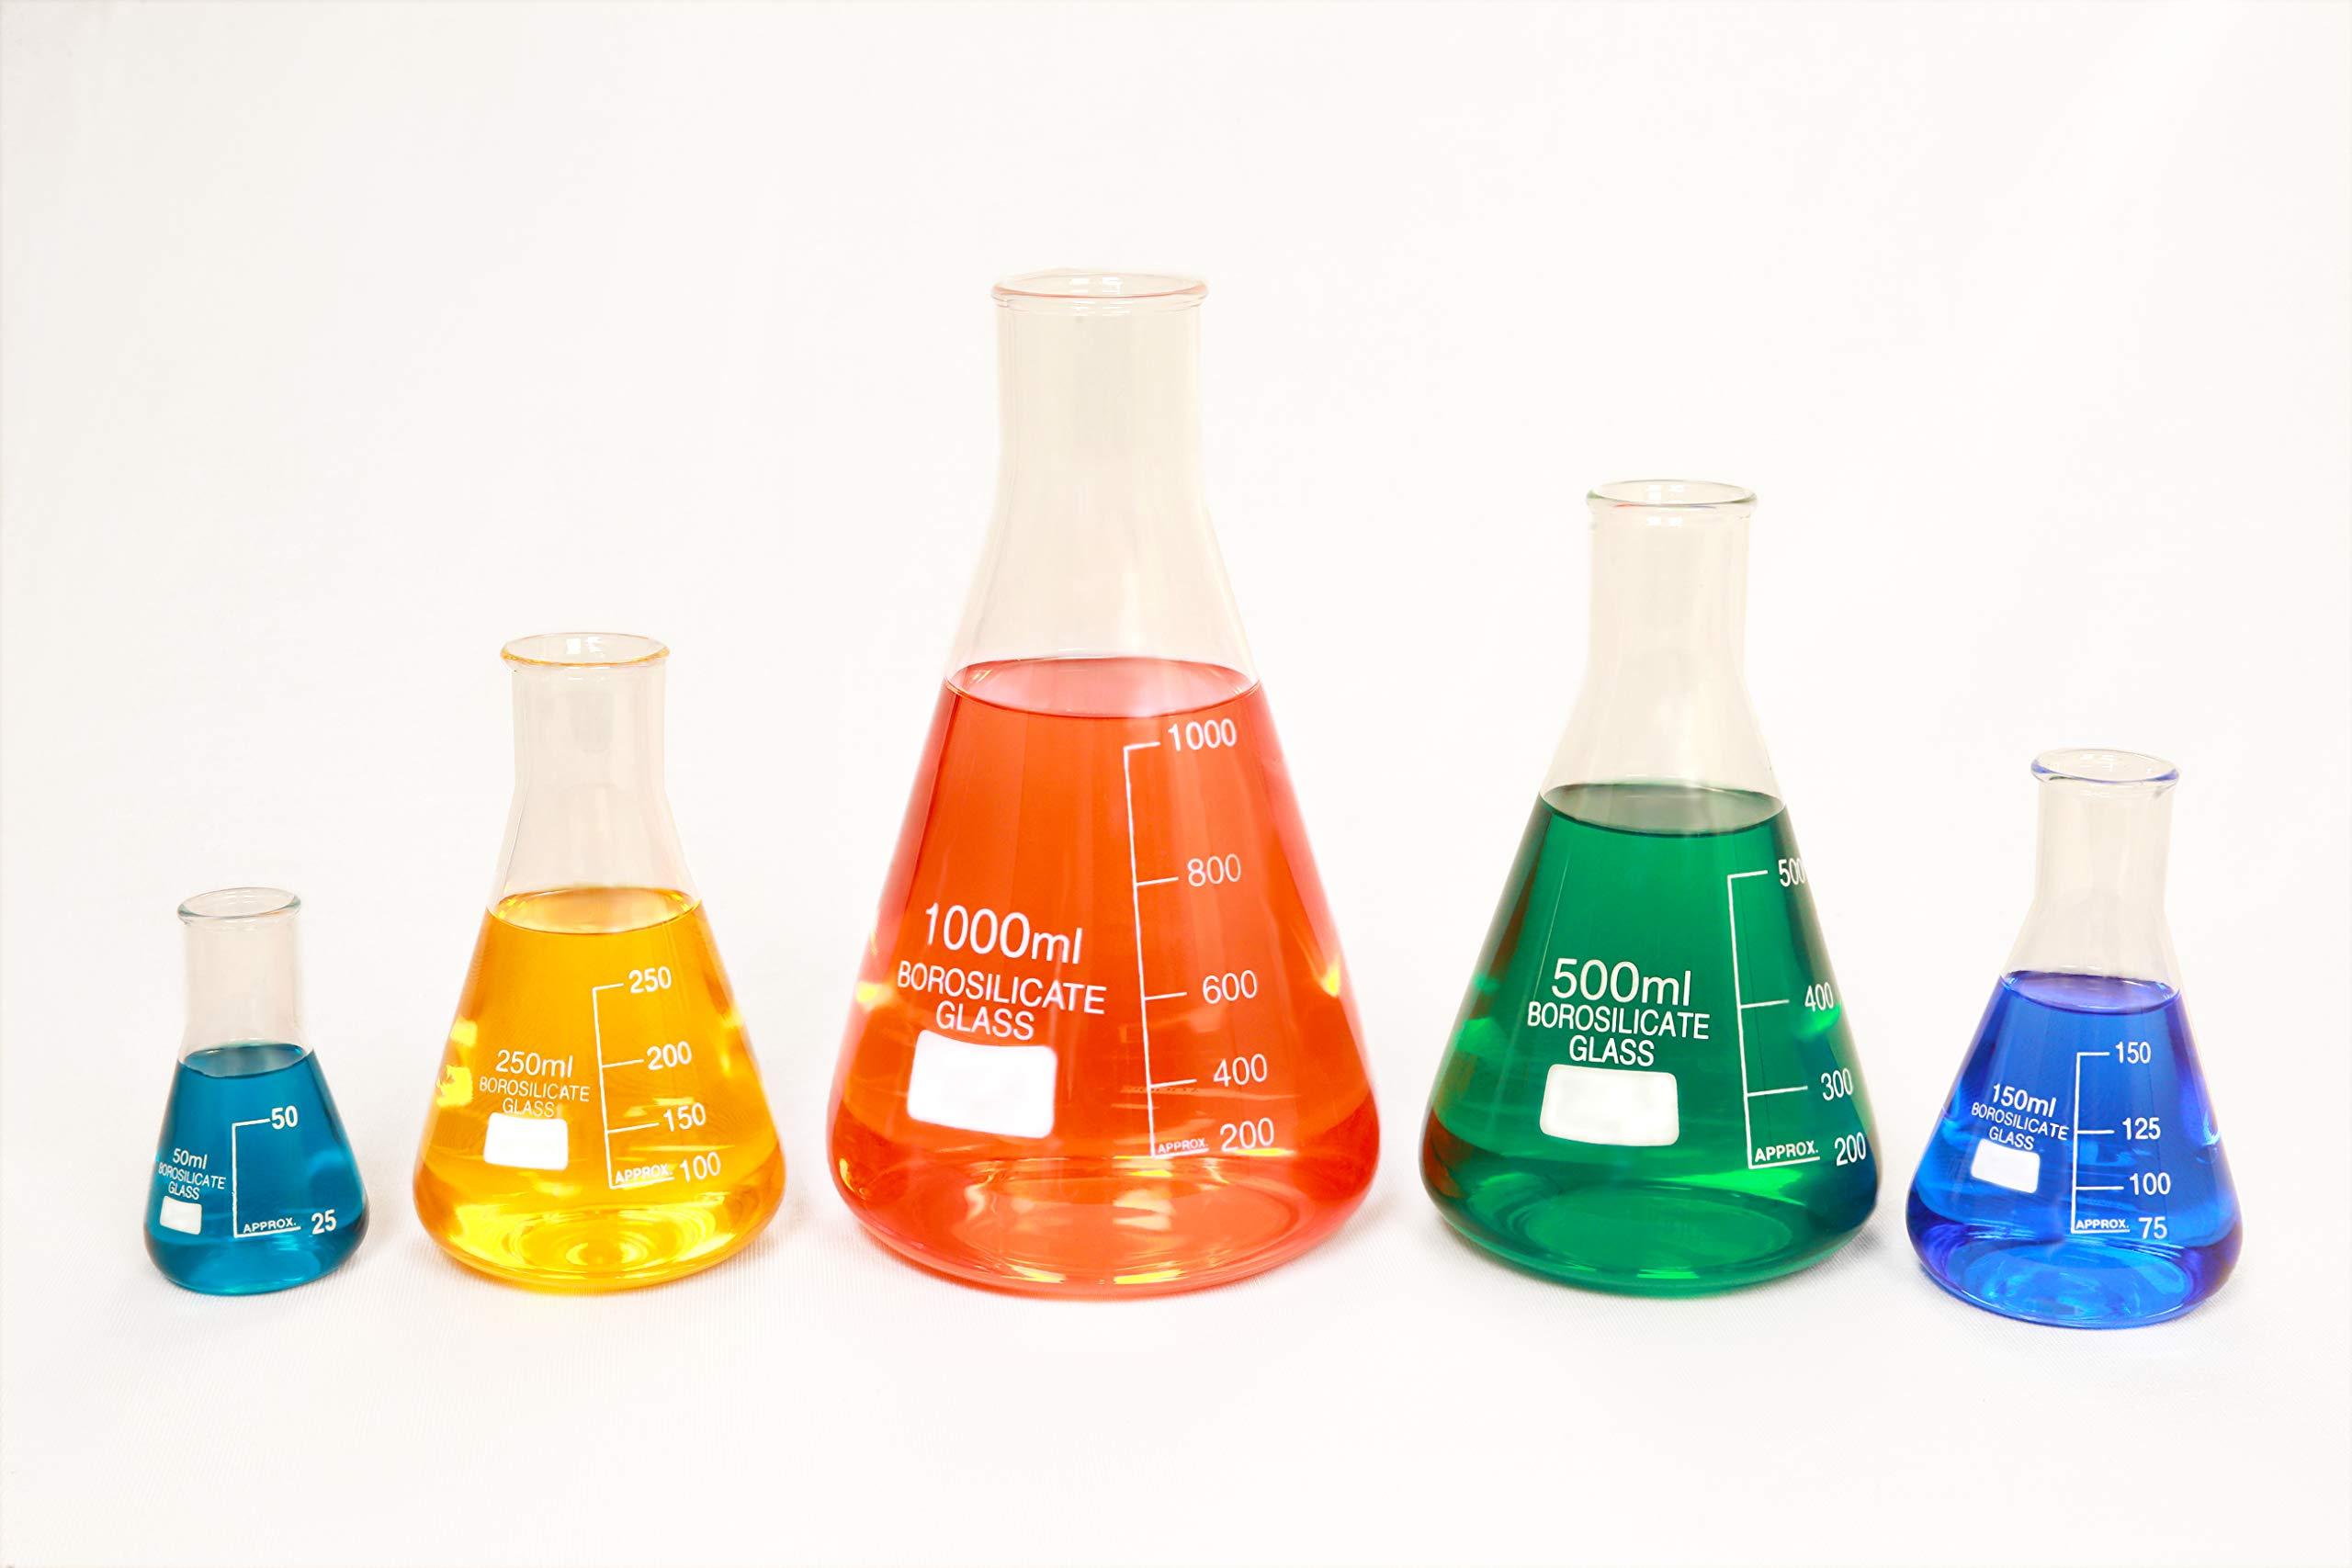 Glass Erlenmeyer Flask Set of 5 Borosilicate Thick Low Form - 50ml, 150ml,  250ml, 500ml, 1000ml